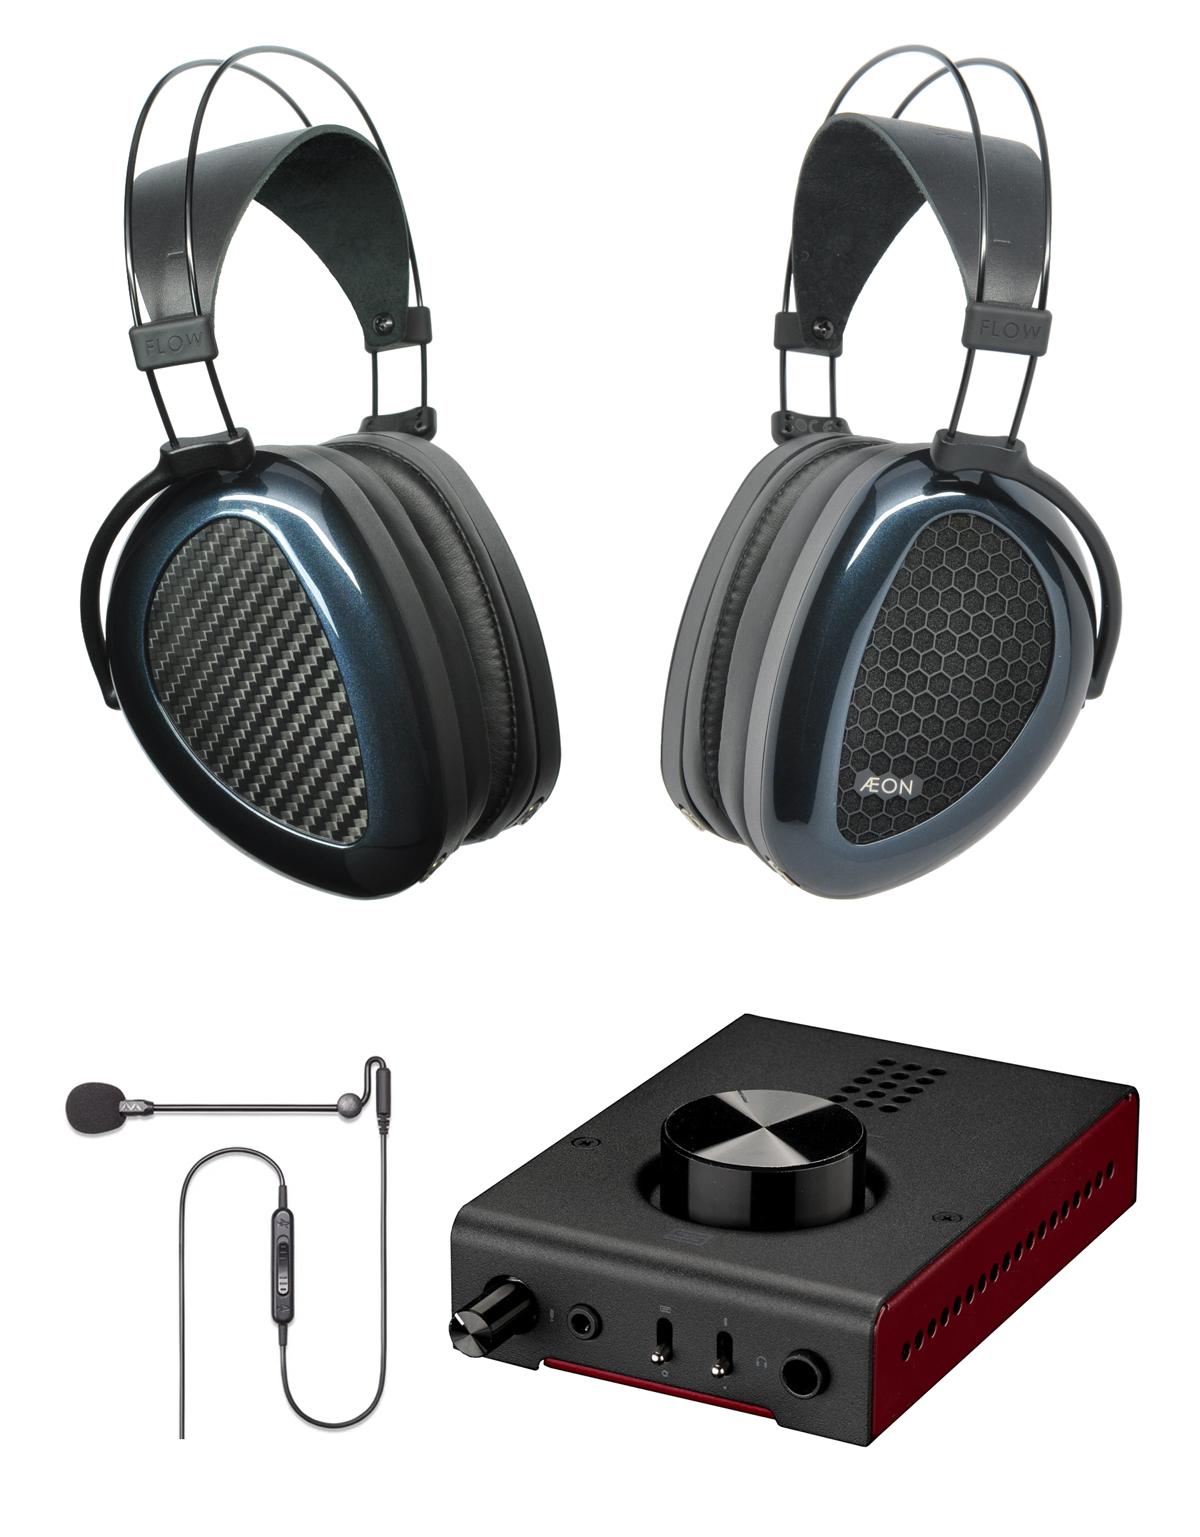 Hel Yeah Home Office, Gaming, Video and Music Bundle!